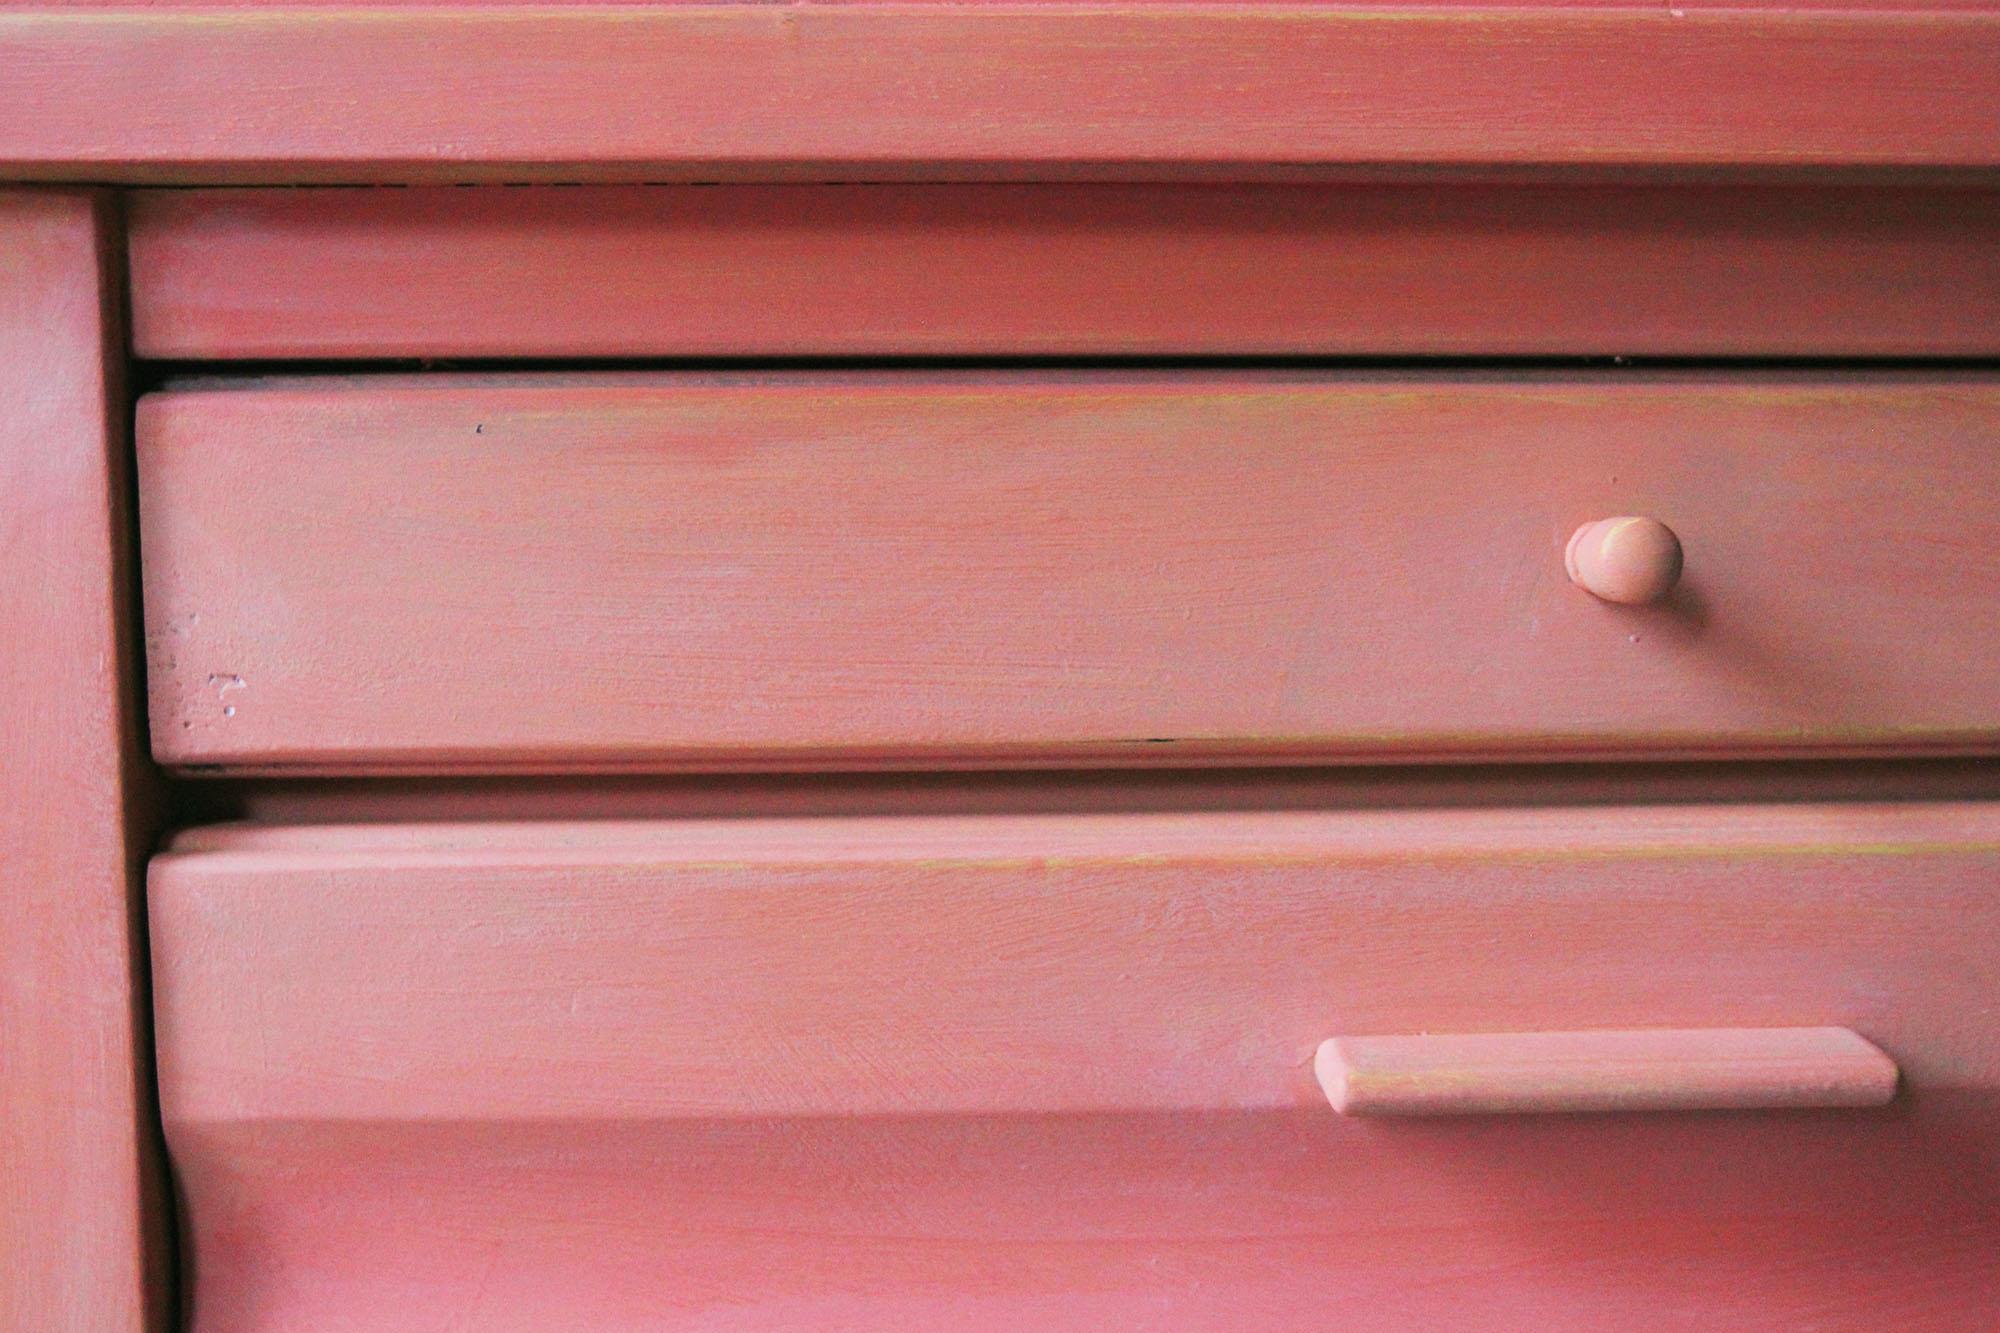 a-simpler-design-annie-sloan-sunset-ombre-dresser-coral-pinkjpg3.jpg